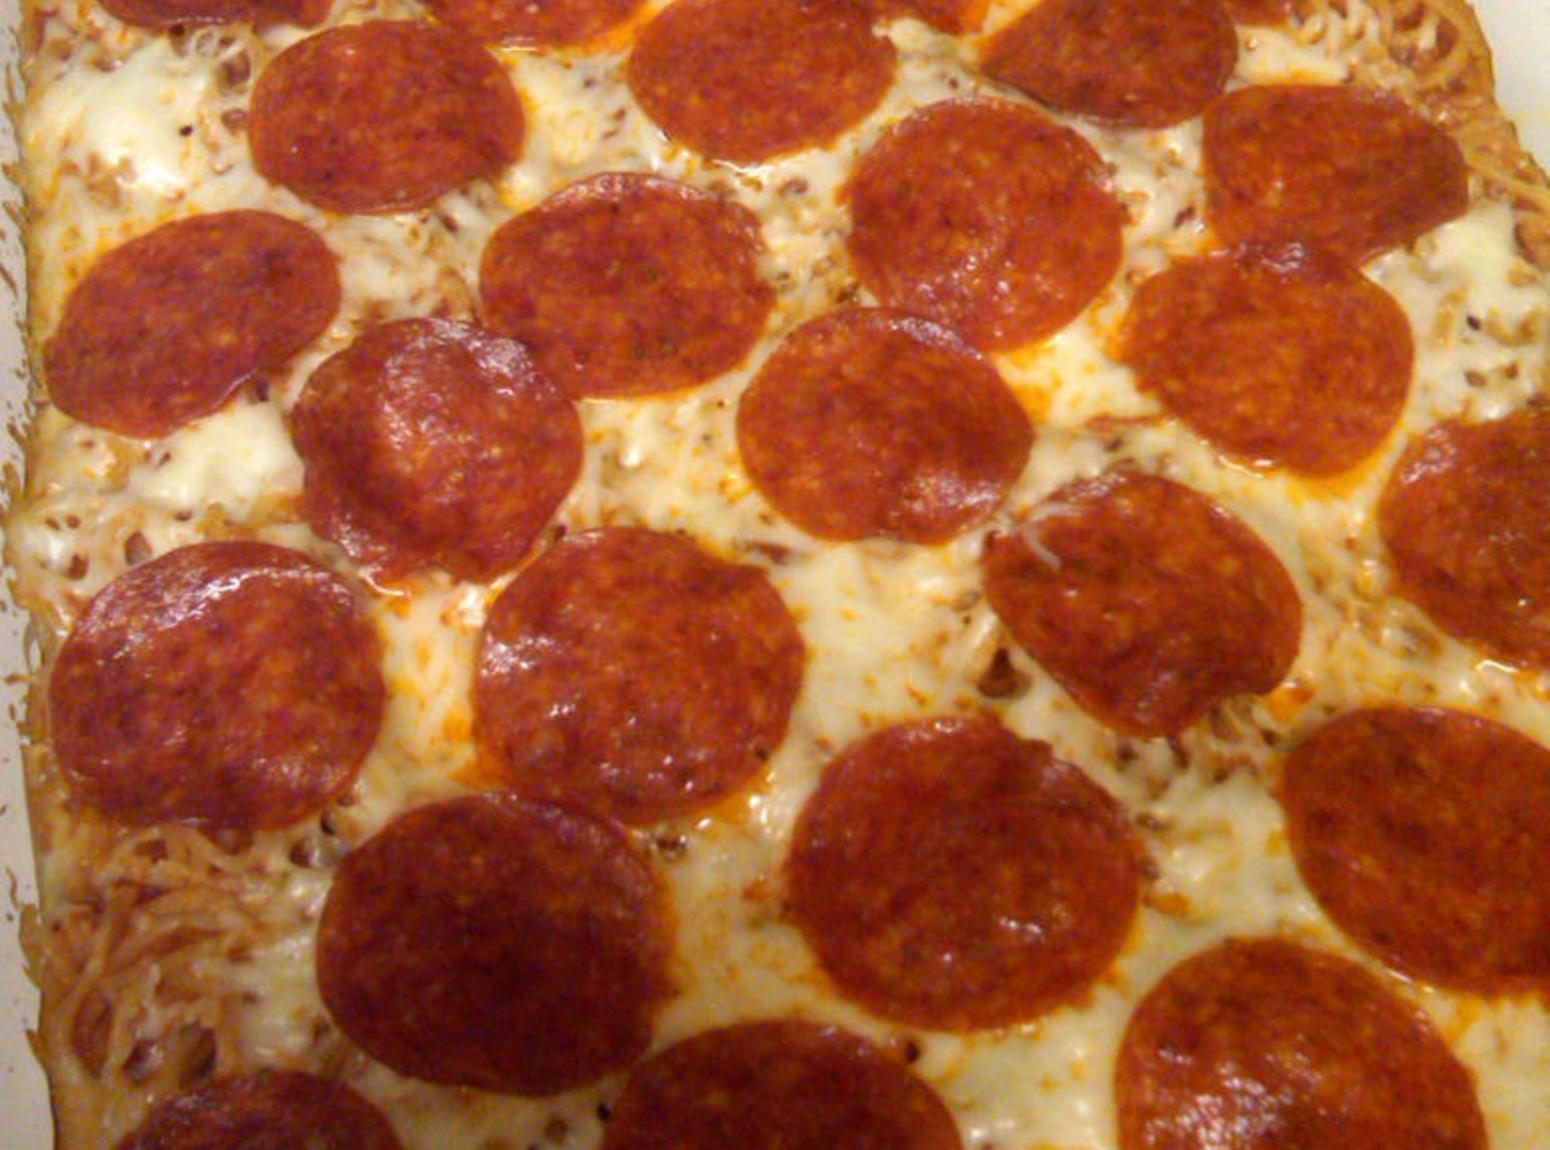 Spaghetti Pizza AKA Baked Spaghetti Recipe